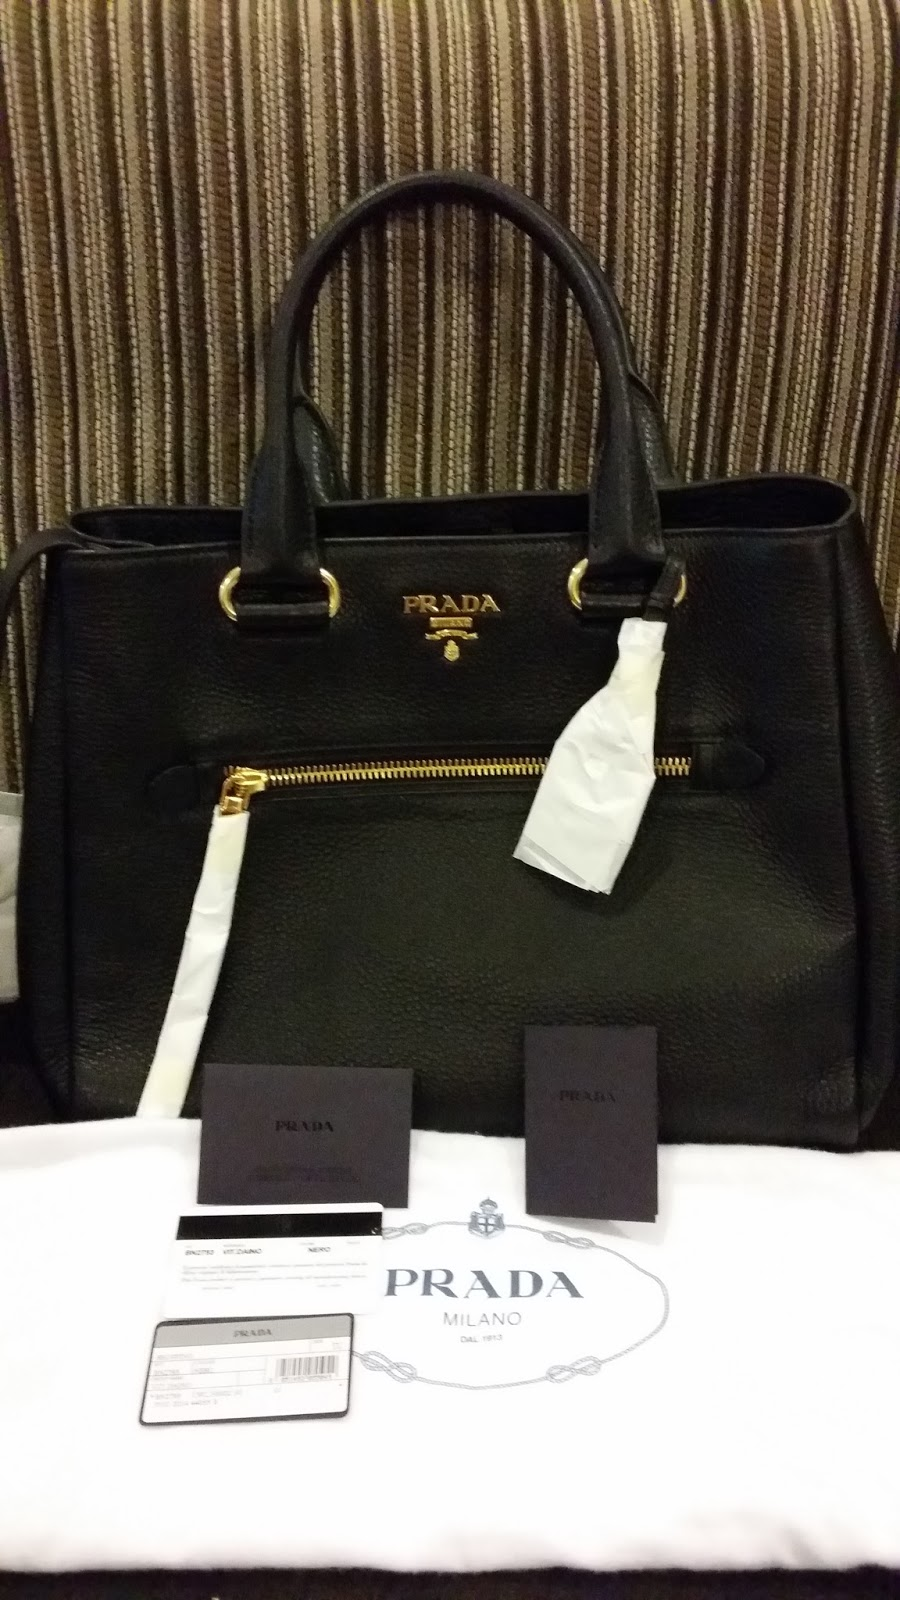 Prada Handbags Ready Stock In Malaysia